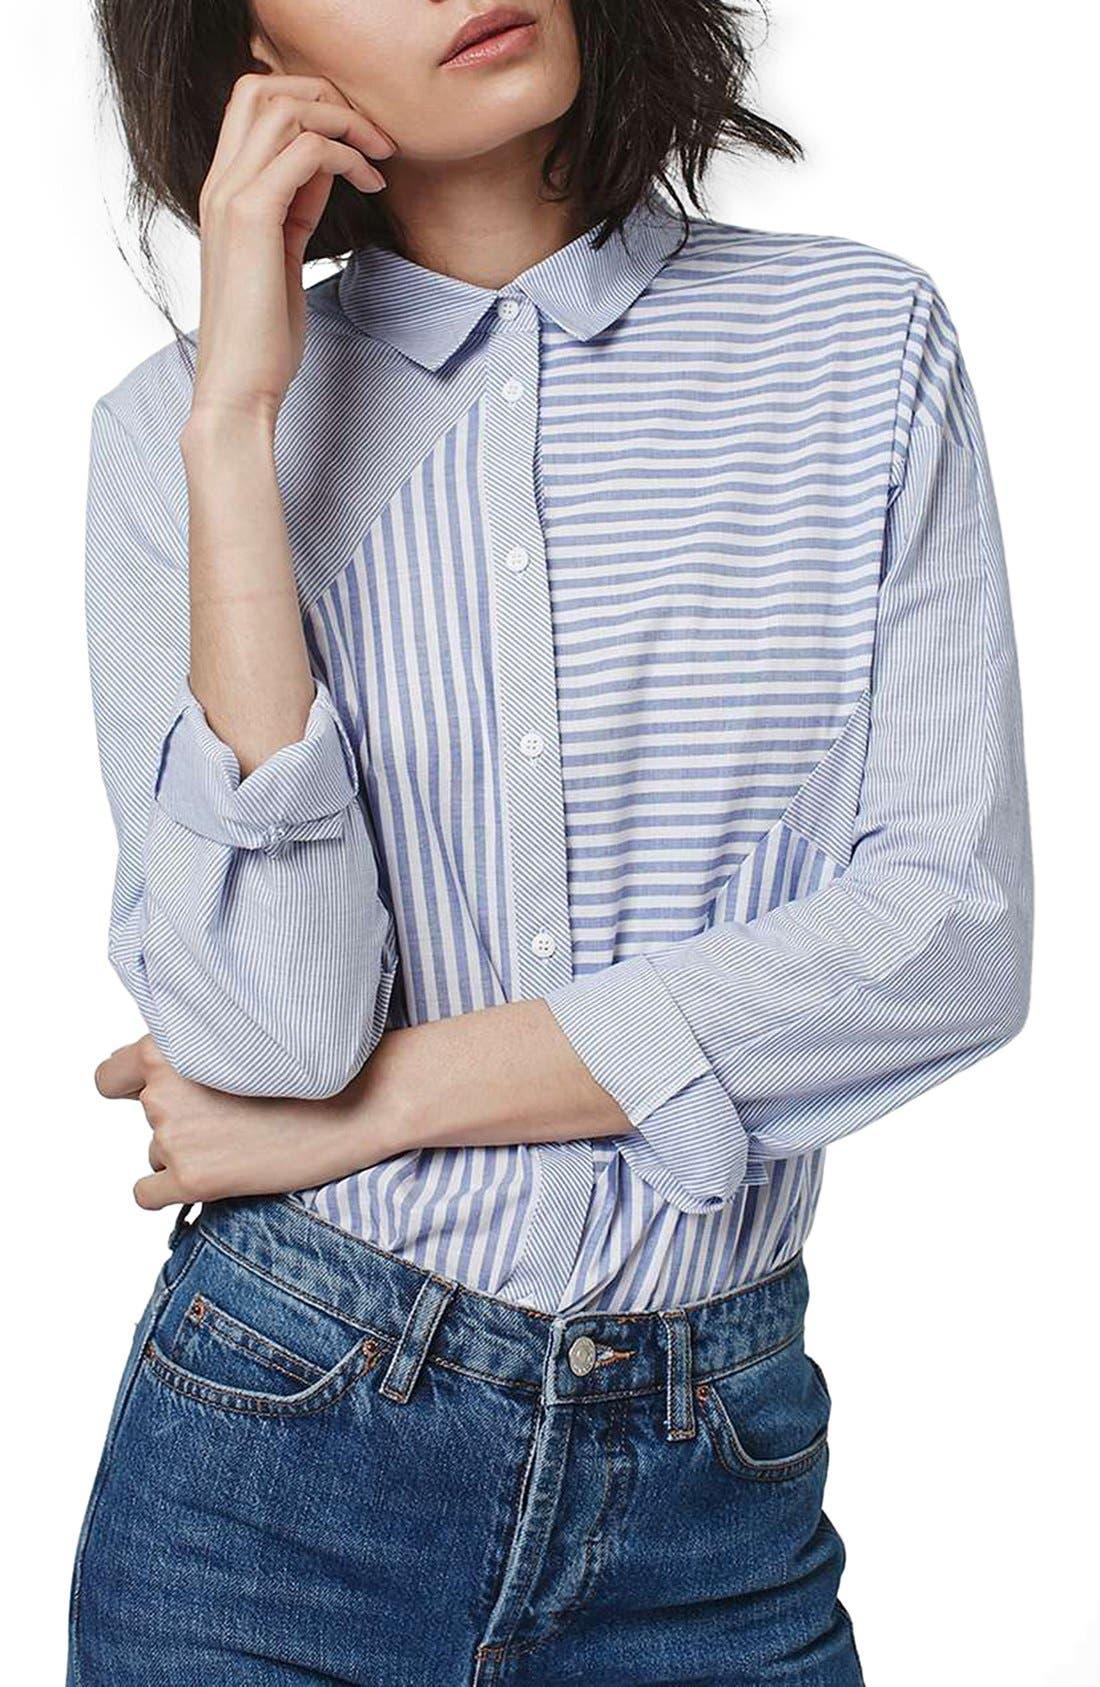 Alternate Image 1 Selected - Topshop 'Harper' Mixed Stripe Shirt